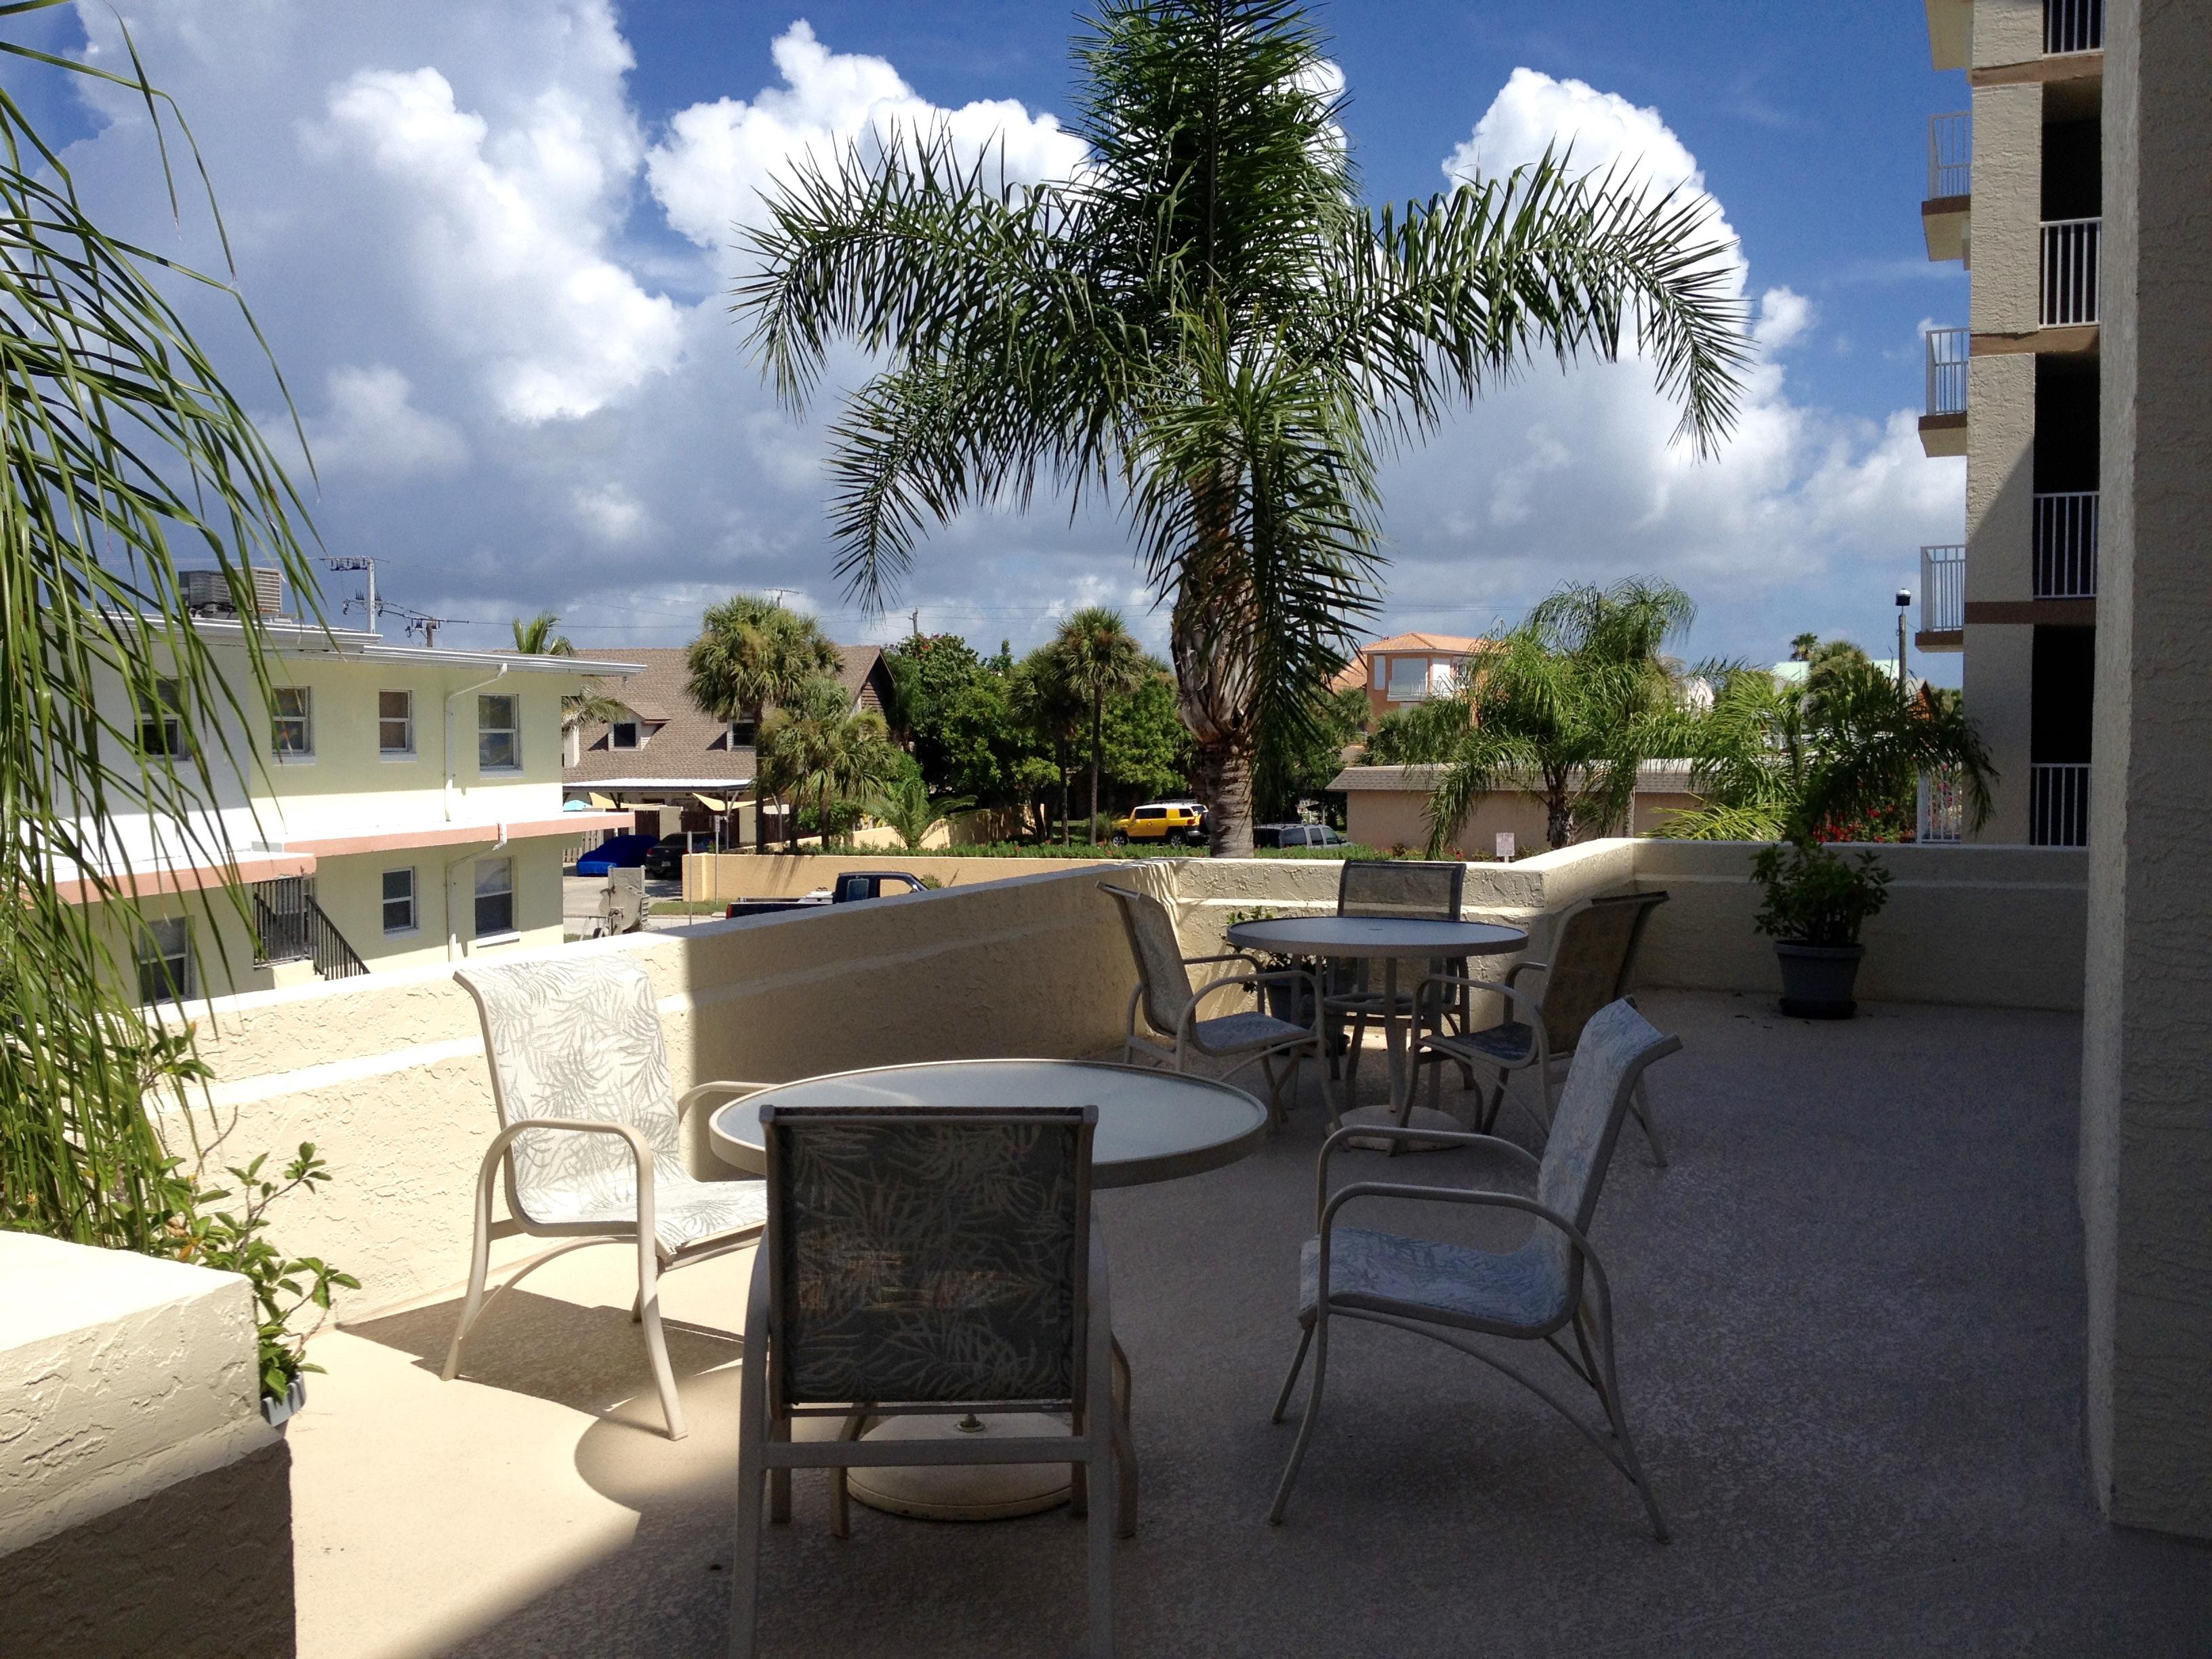 Sea Era Sands 405 Luxury 187 King Rentals Cocoa Beach Florida Hotel Vacation Rentals